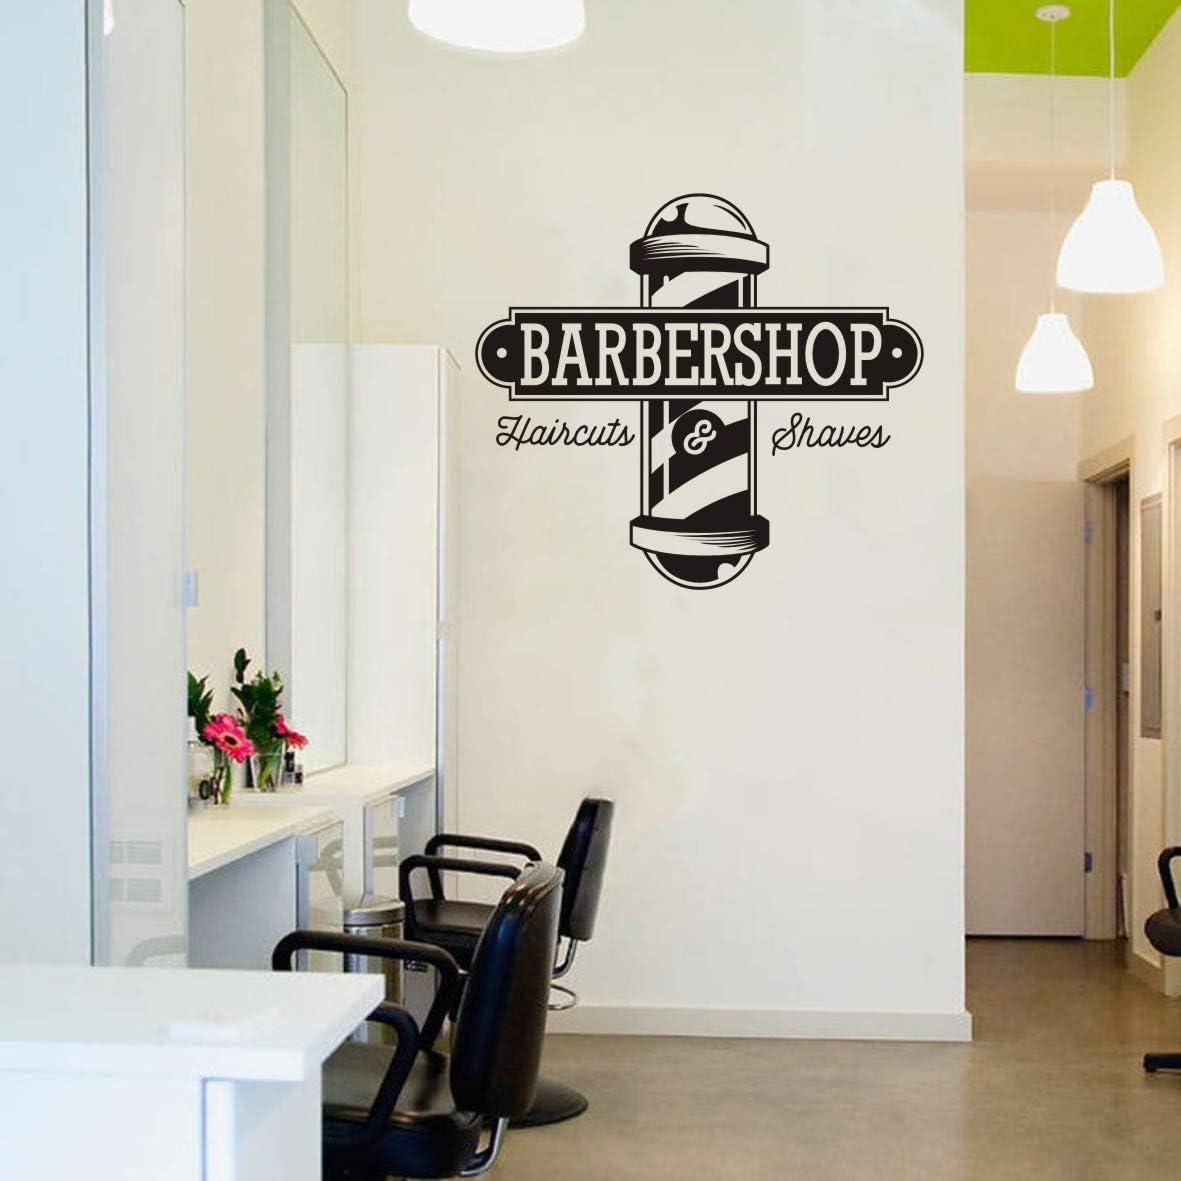 Vinyl Sticker Haircuts and Shaves Wall Decal Hairdresser Barbershop Logo Window Wall Mural Hair Salon AY1117 (57X62CM, Black)